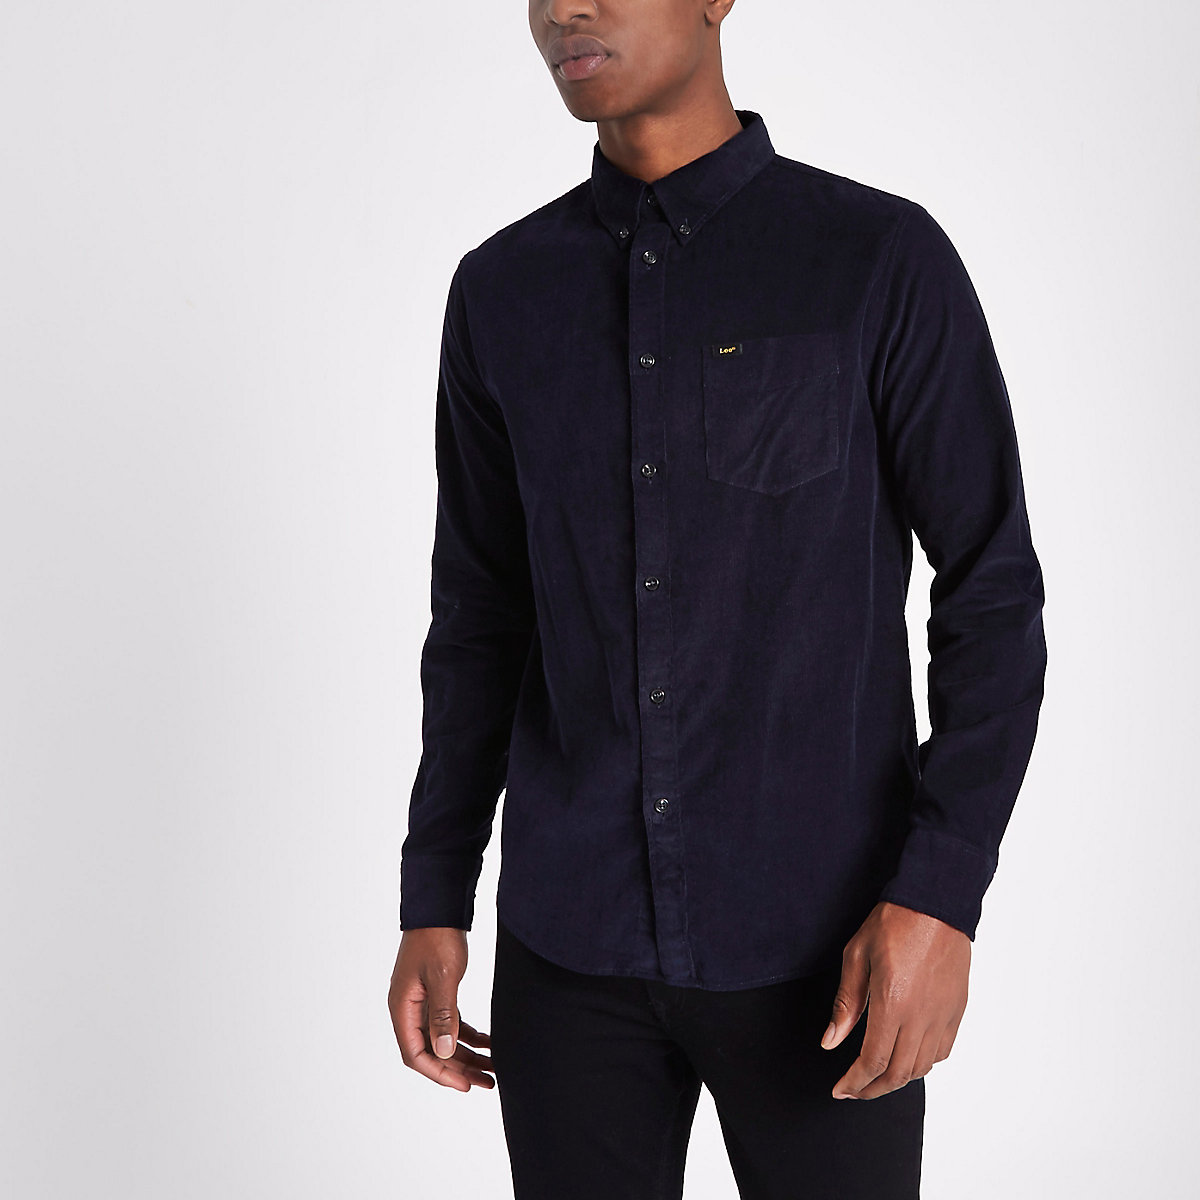 Lee navy cord button-down Oxford shirt